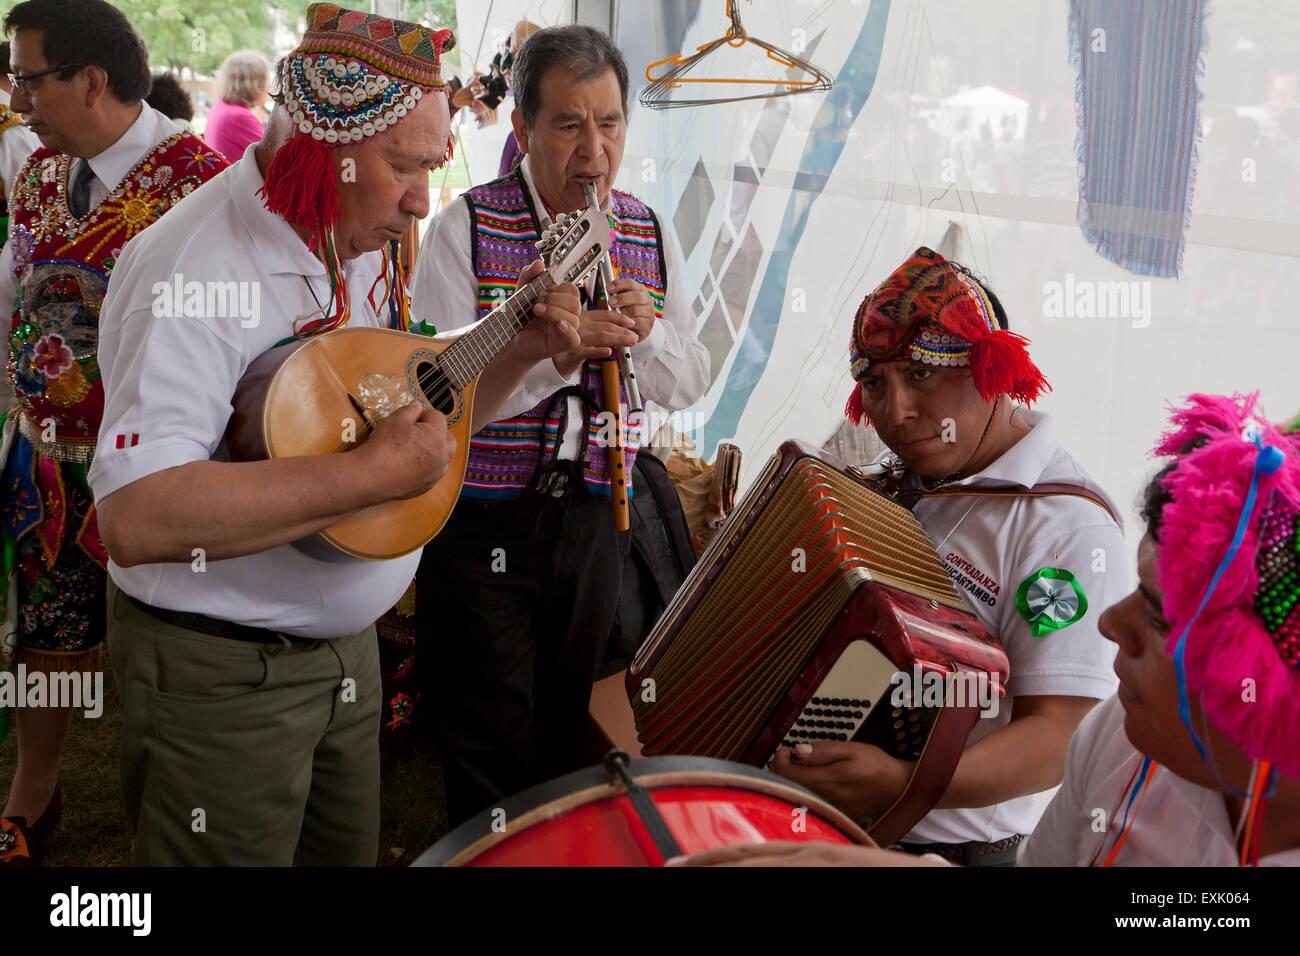 Peruvian native (Quechua) music band - Stock Image